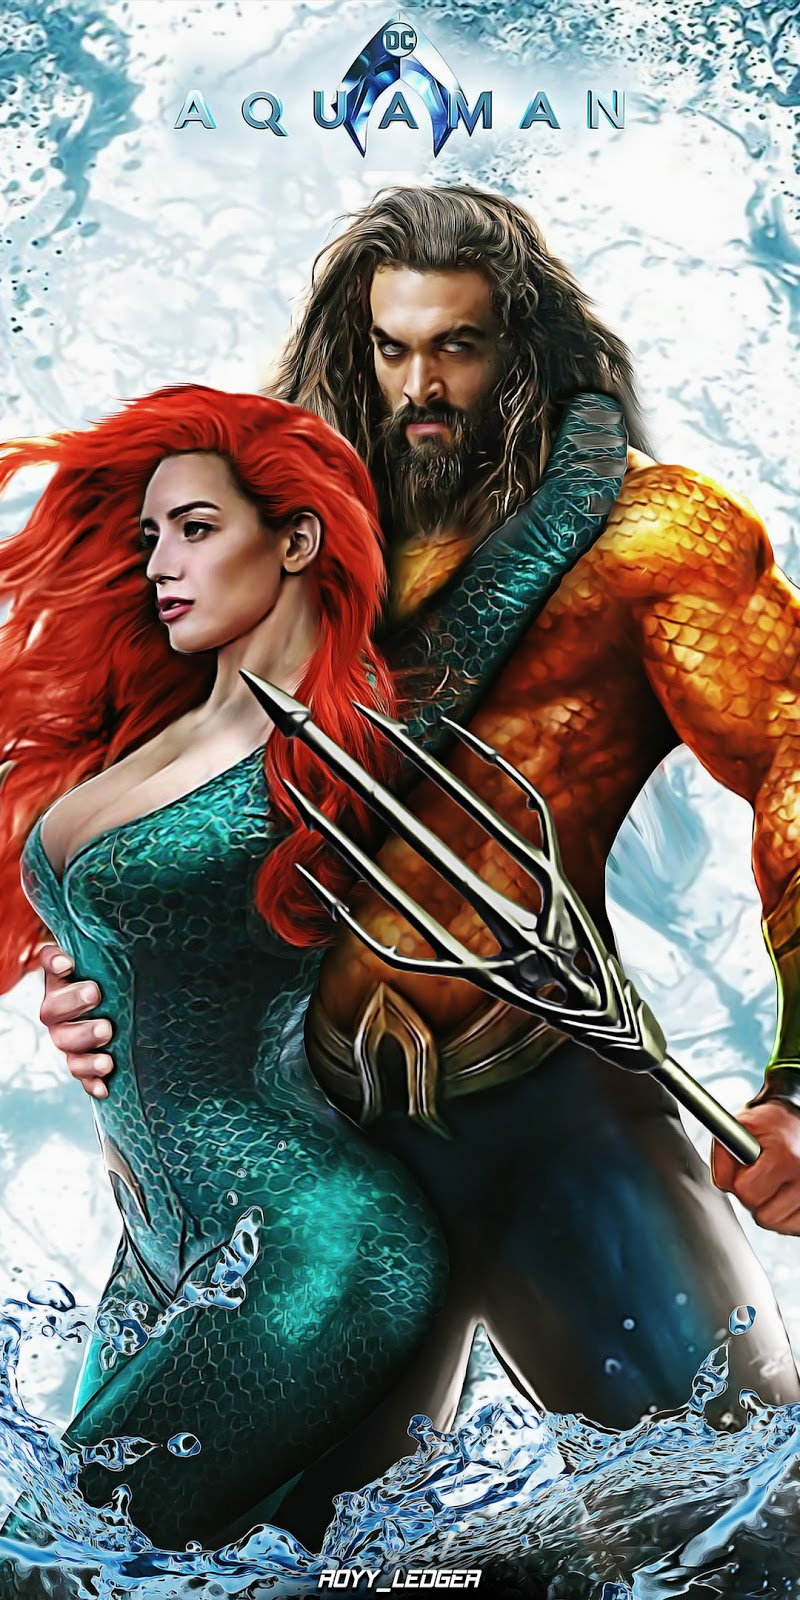 Aquaman (2018) HDRip 480p With Arabic Subs